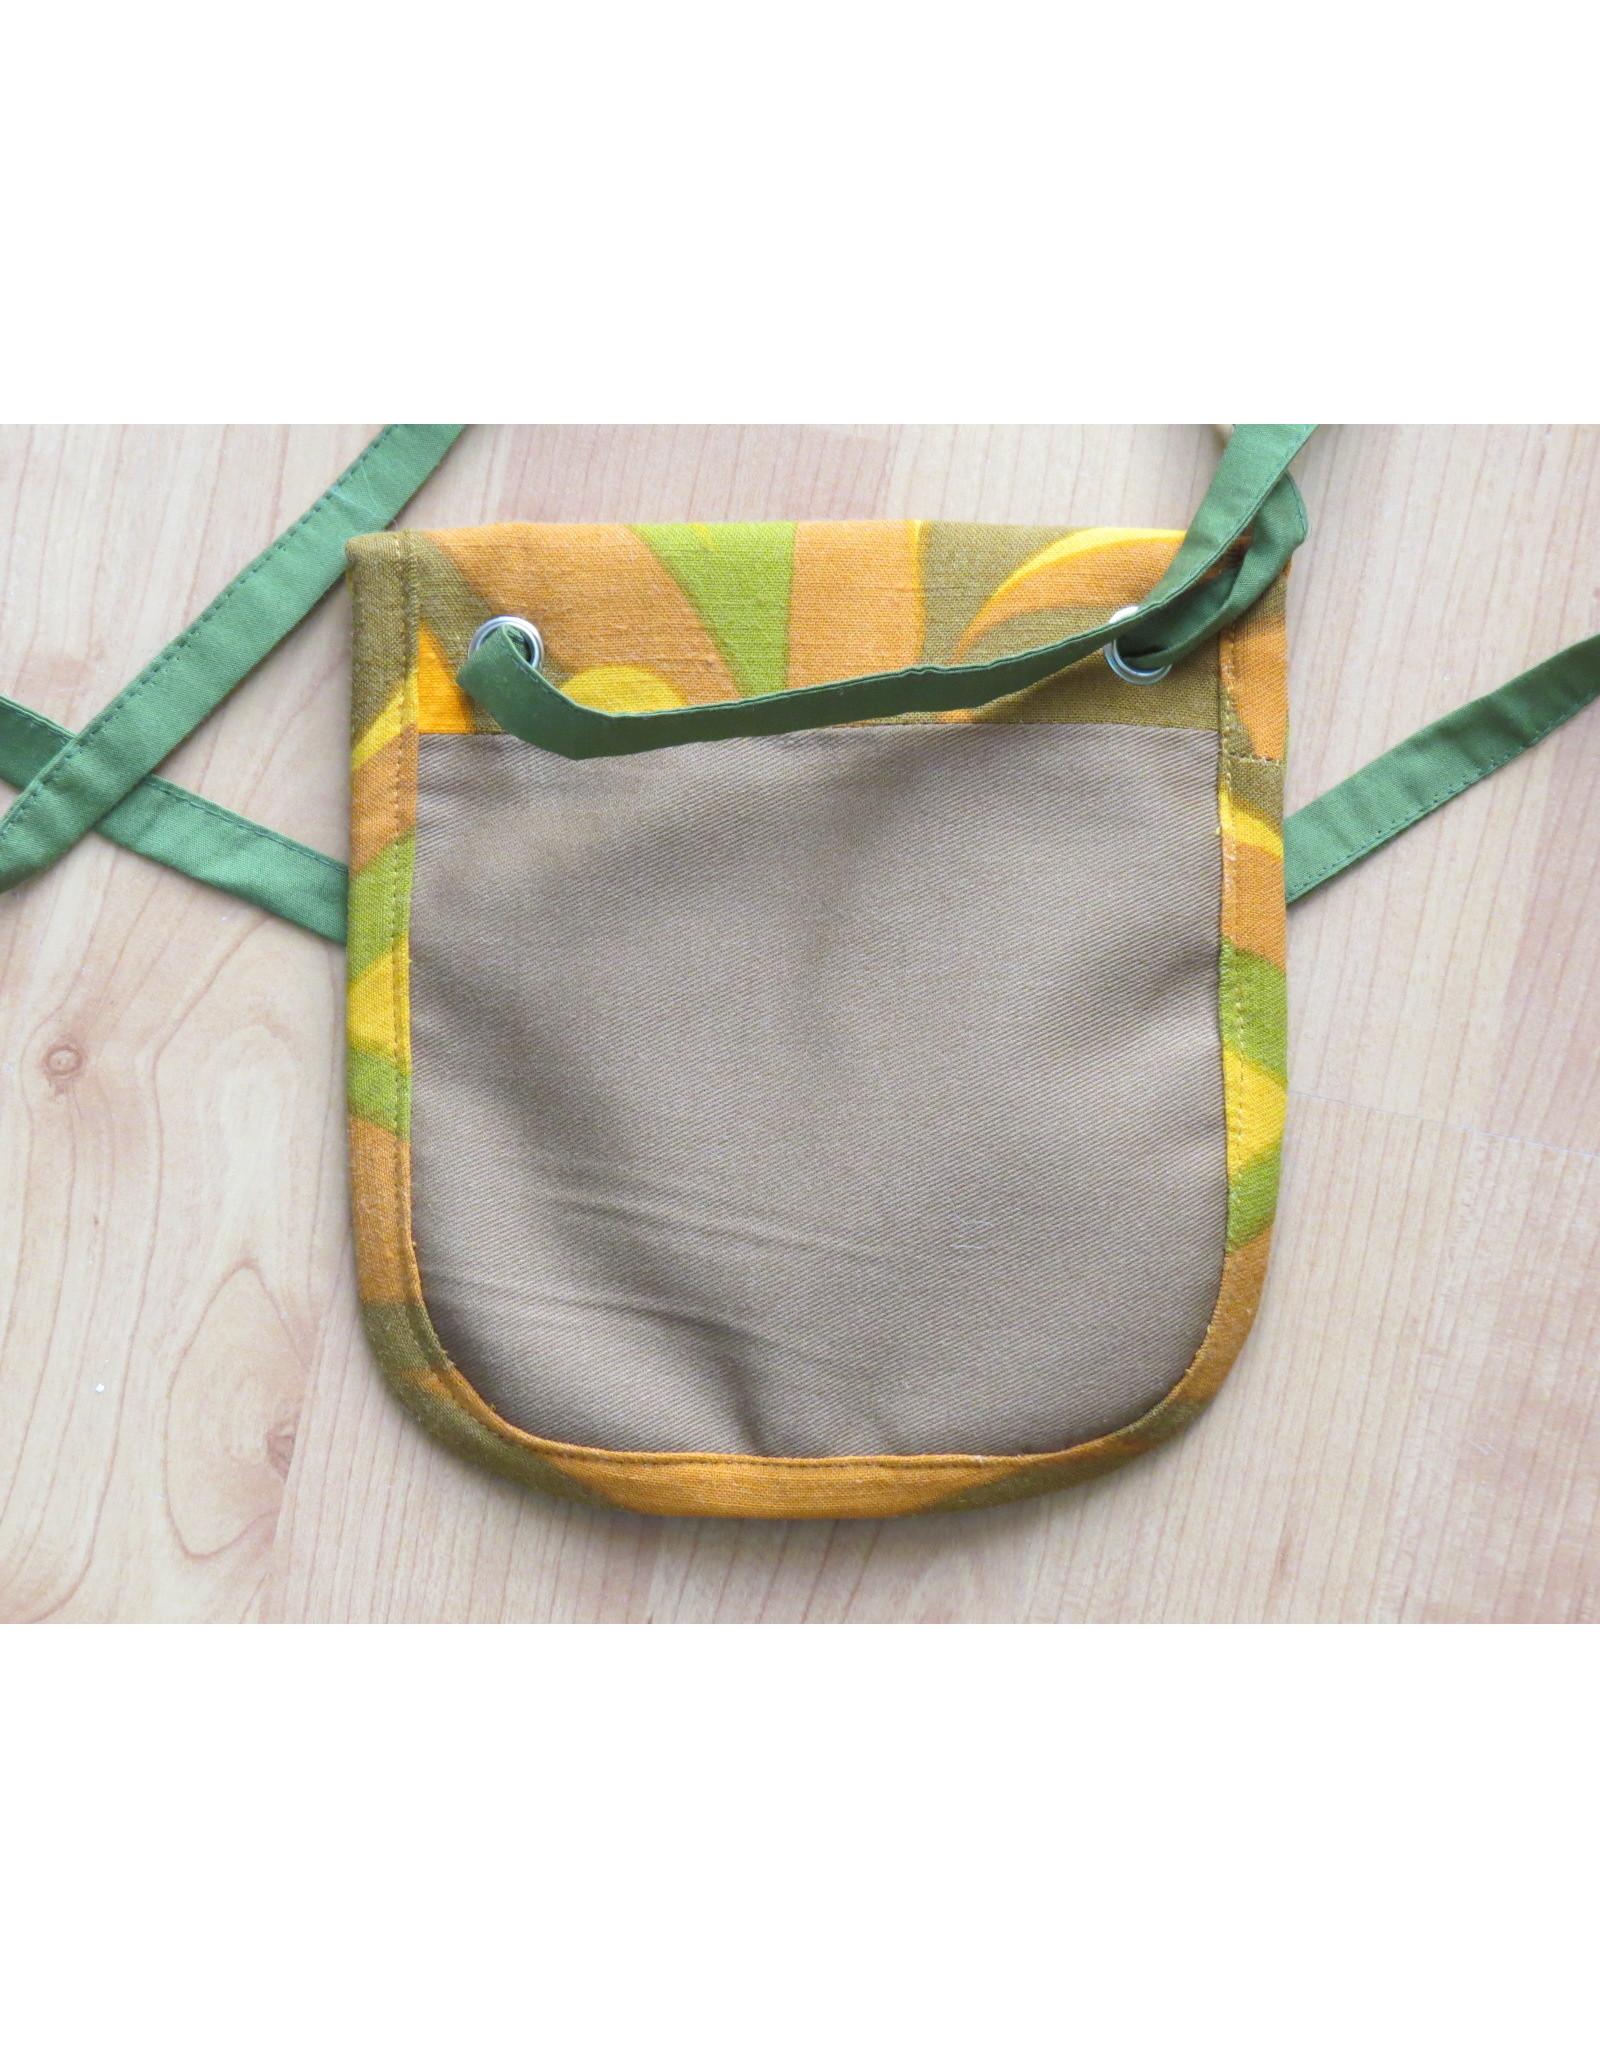 Huisteil Small shoulder bag - yellow retro print